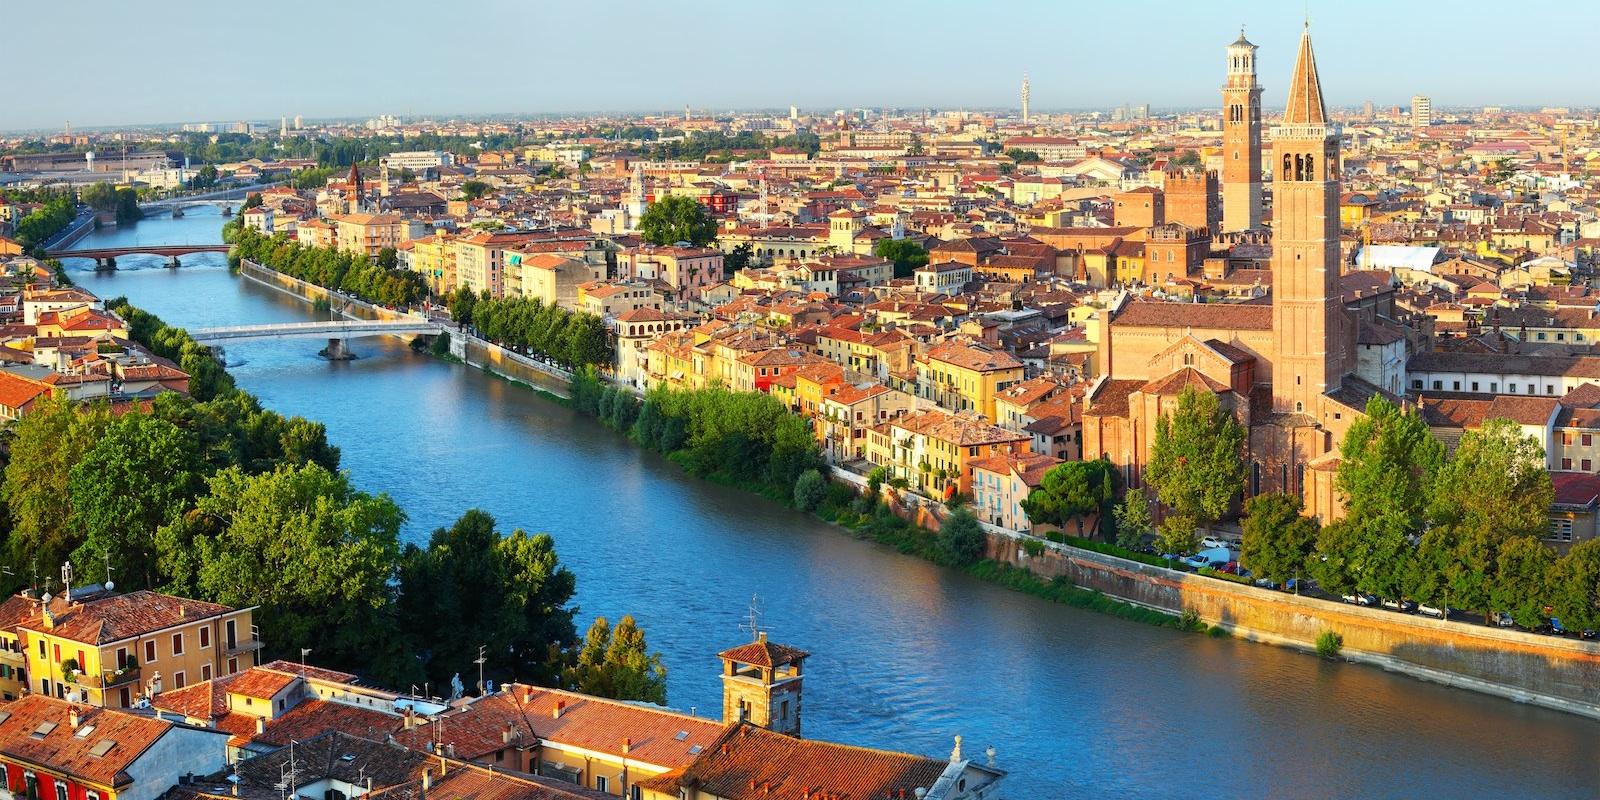 Verona's guide